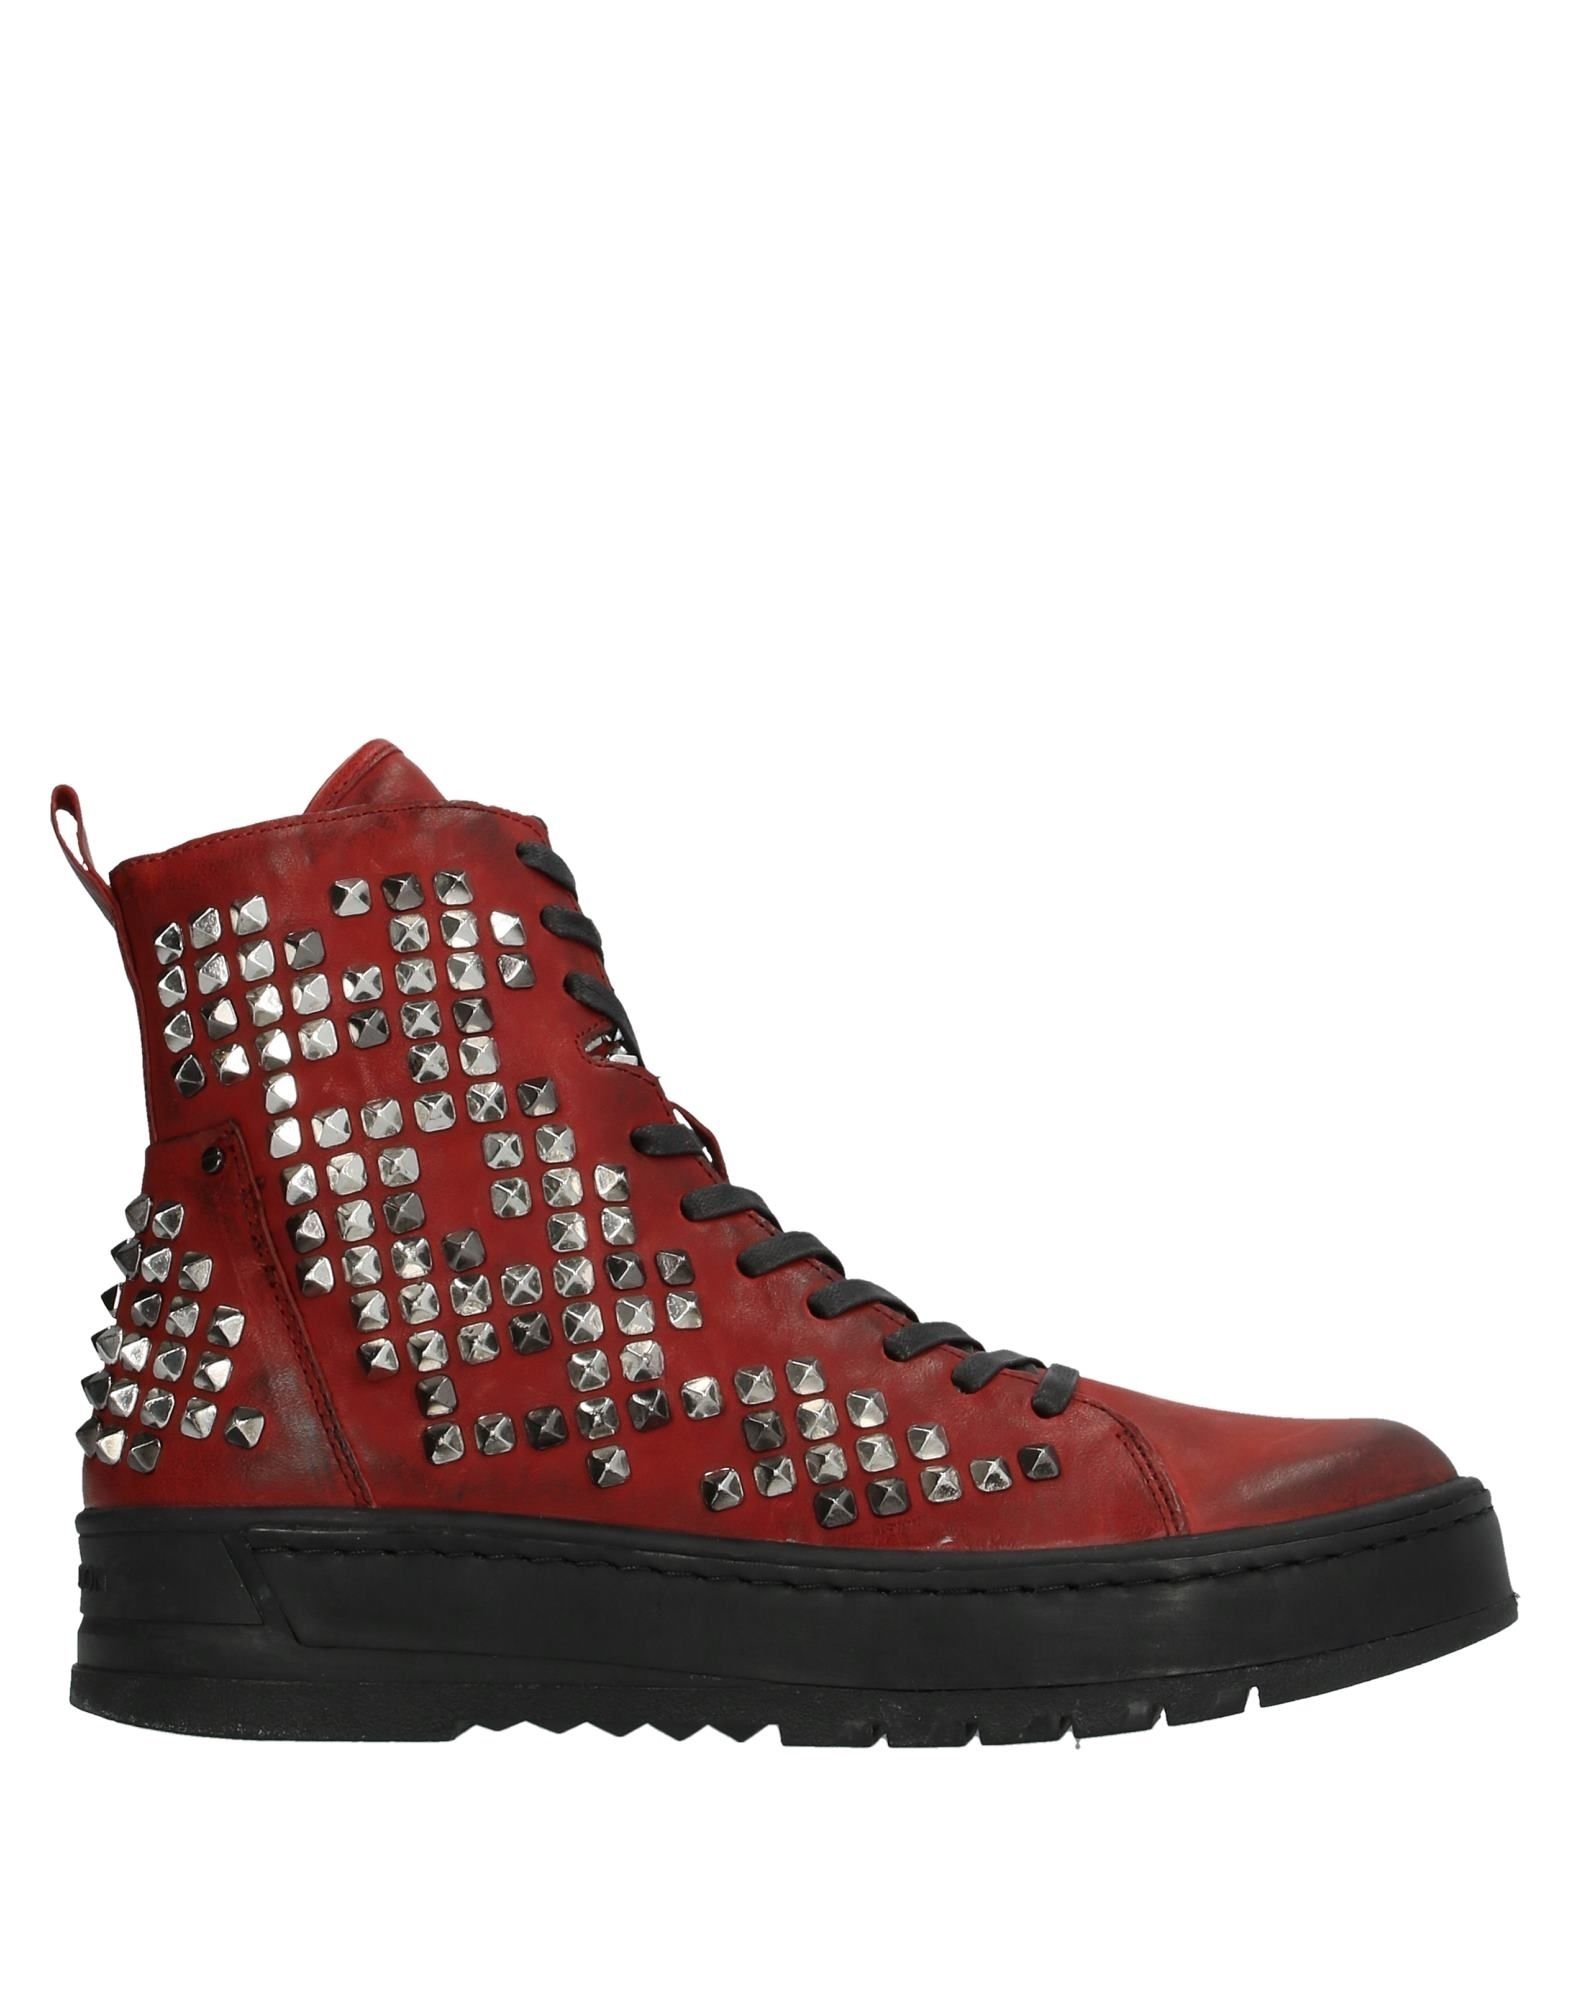 CRIME London Полусапоги и высокие ботинки lucy choi london полусапоги и высокие ботинки